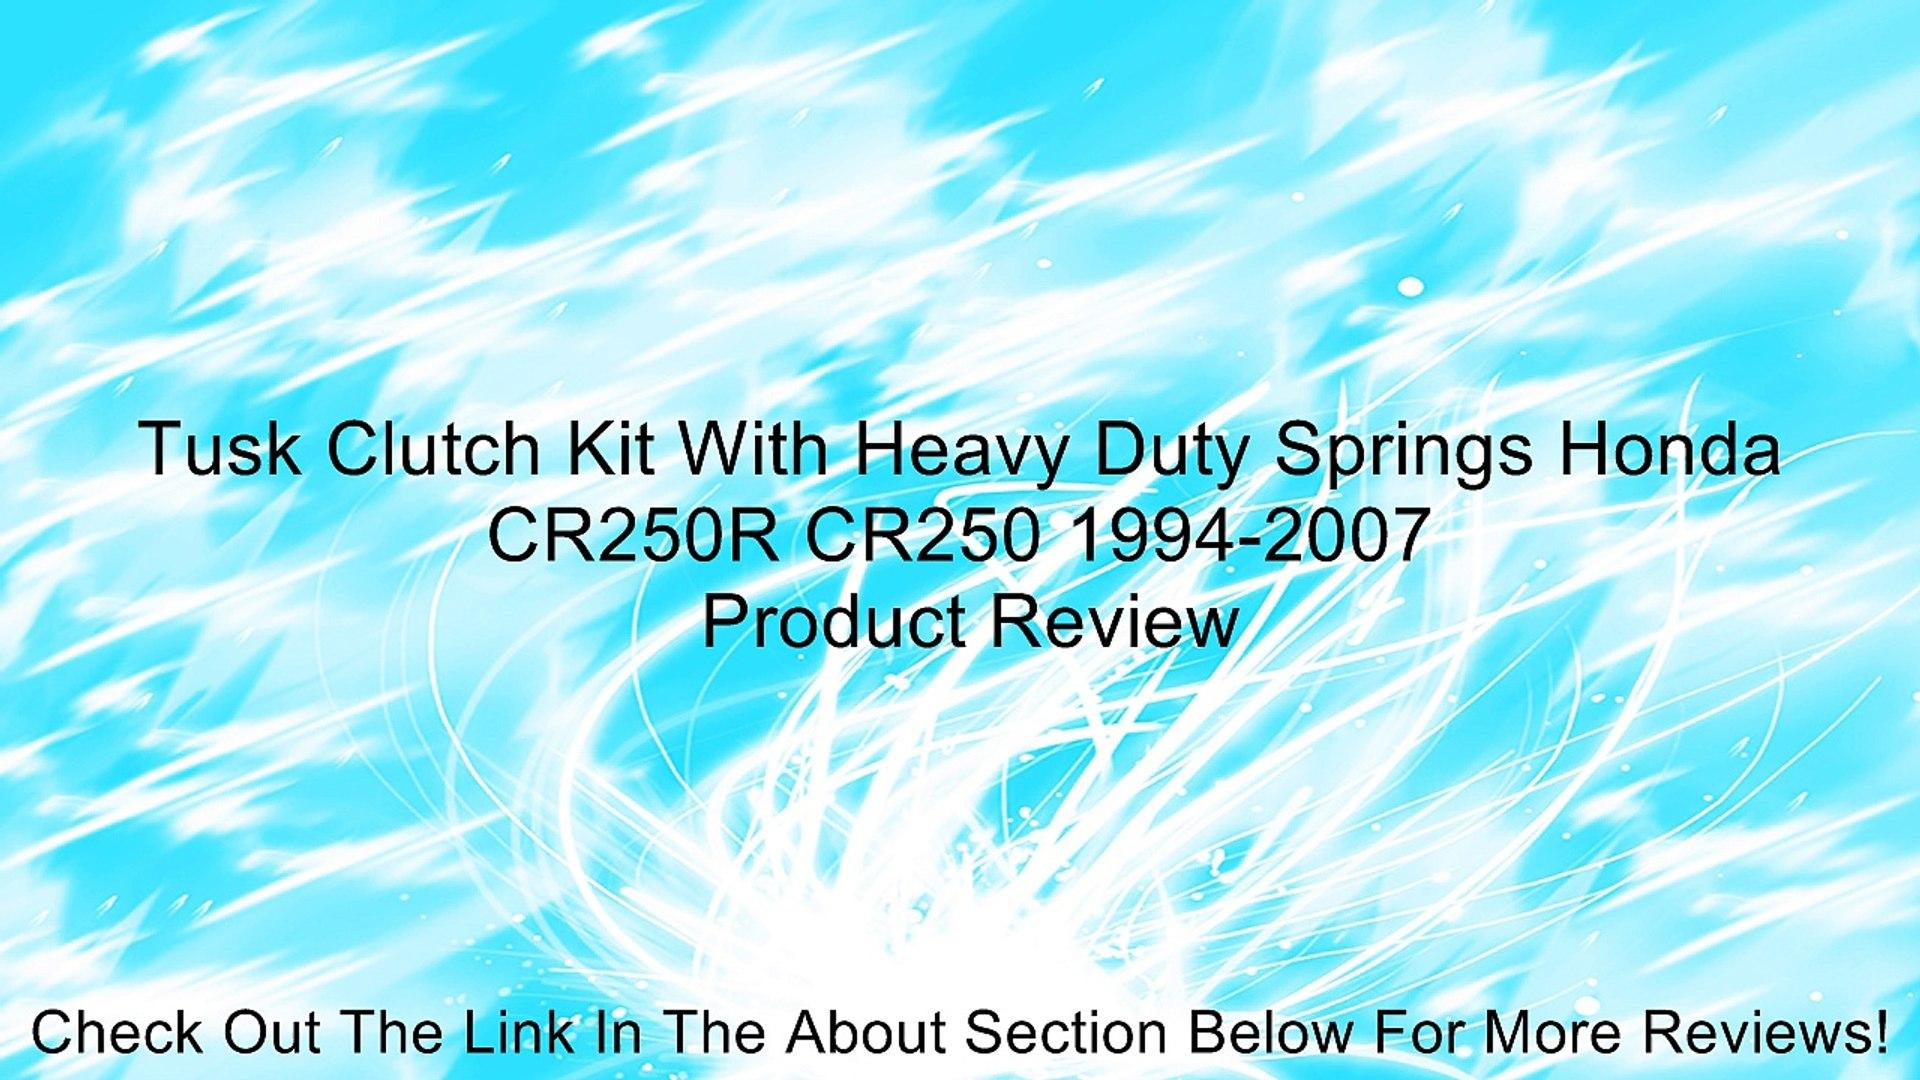 Tusk Clutch Kit With Heavy Duty Springs YAMAHA WARRIOR 350 1987-2004 NEW